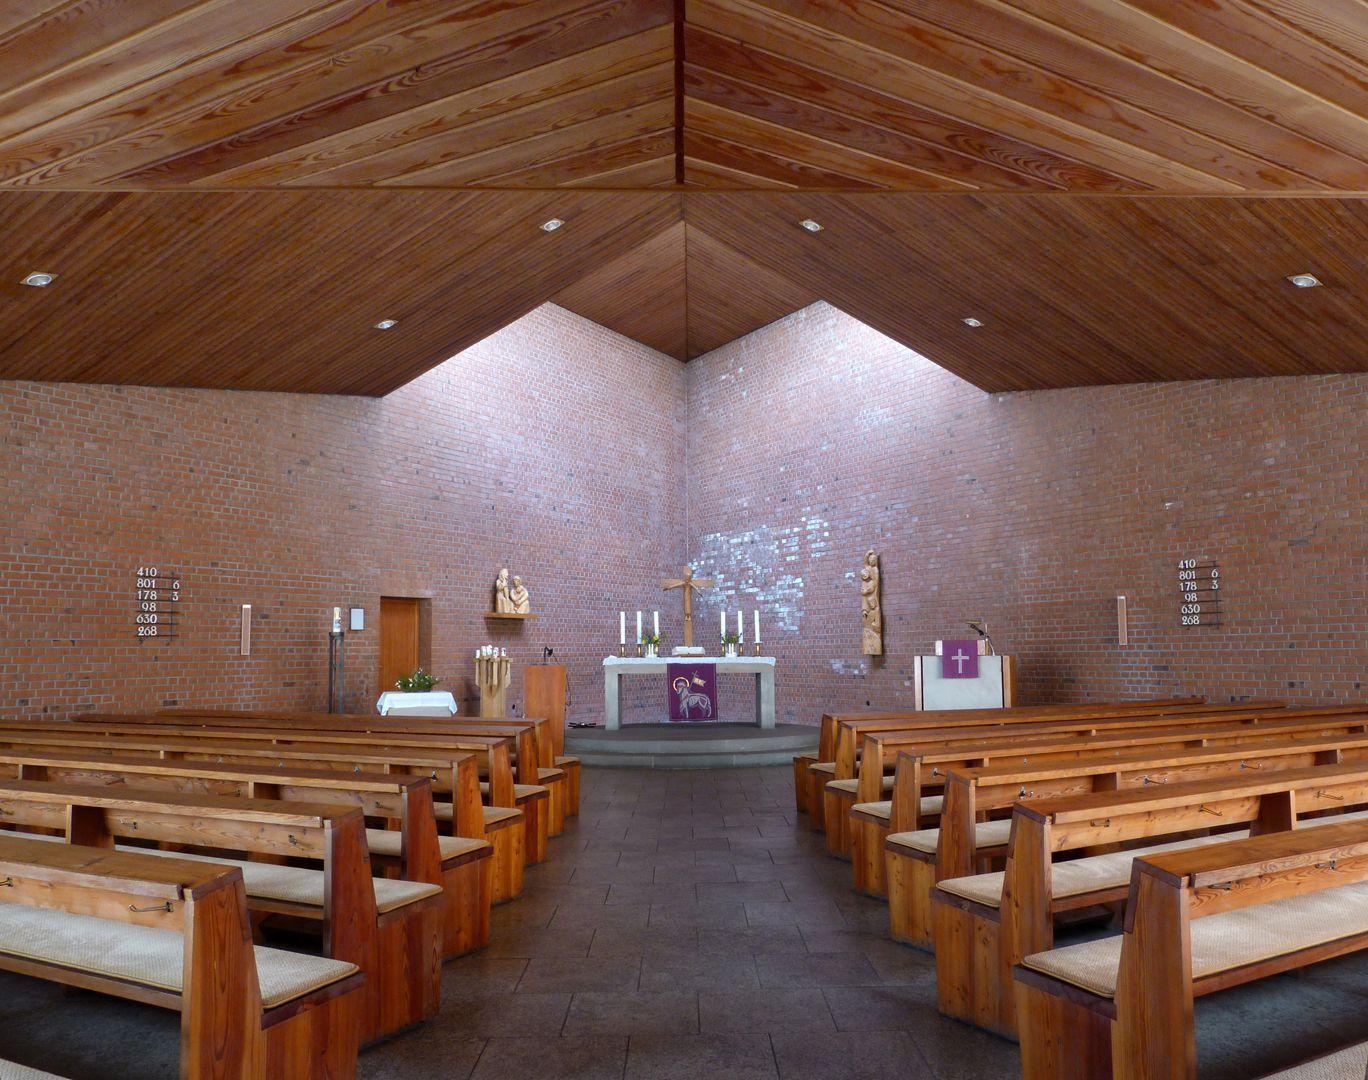 Himmelfahrtskirche Blick nach Norden zum Altarraum